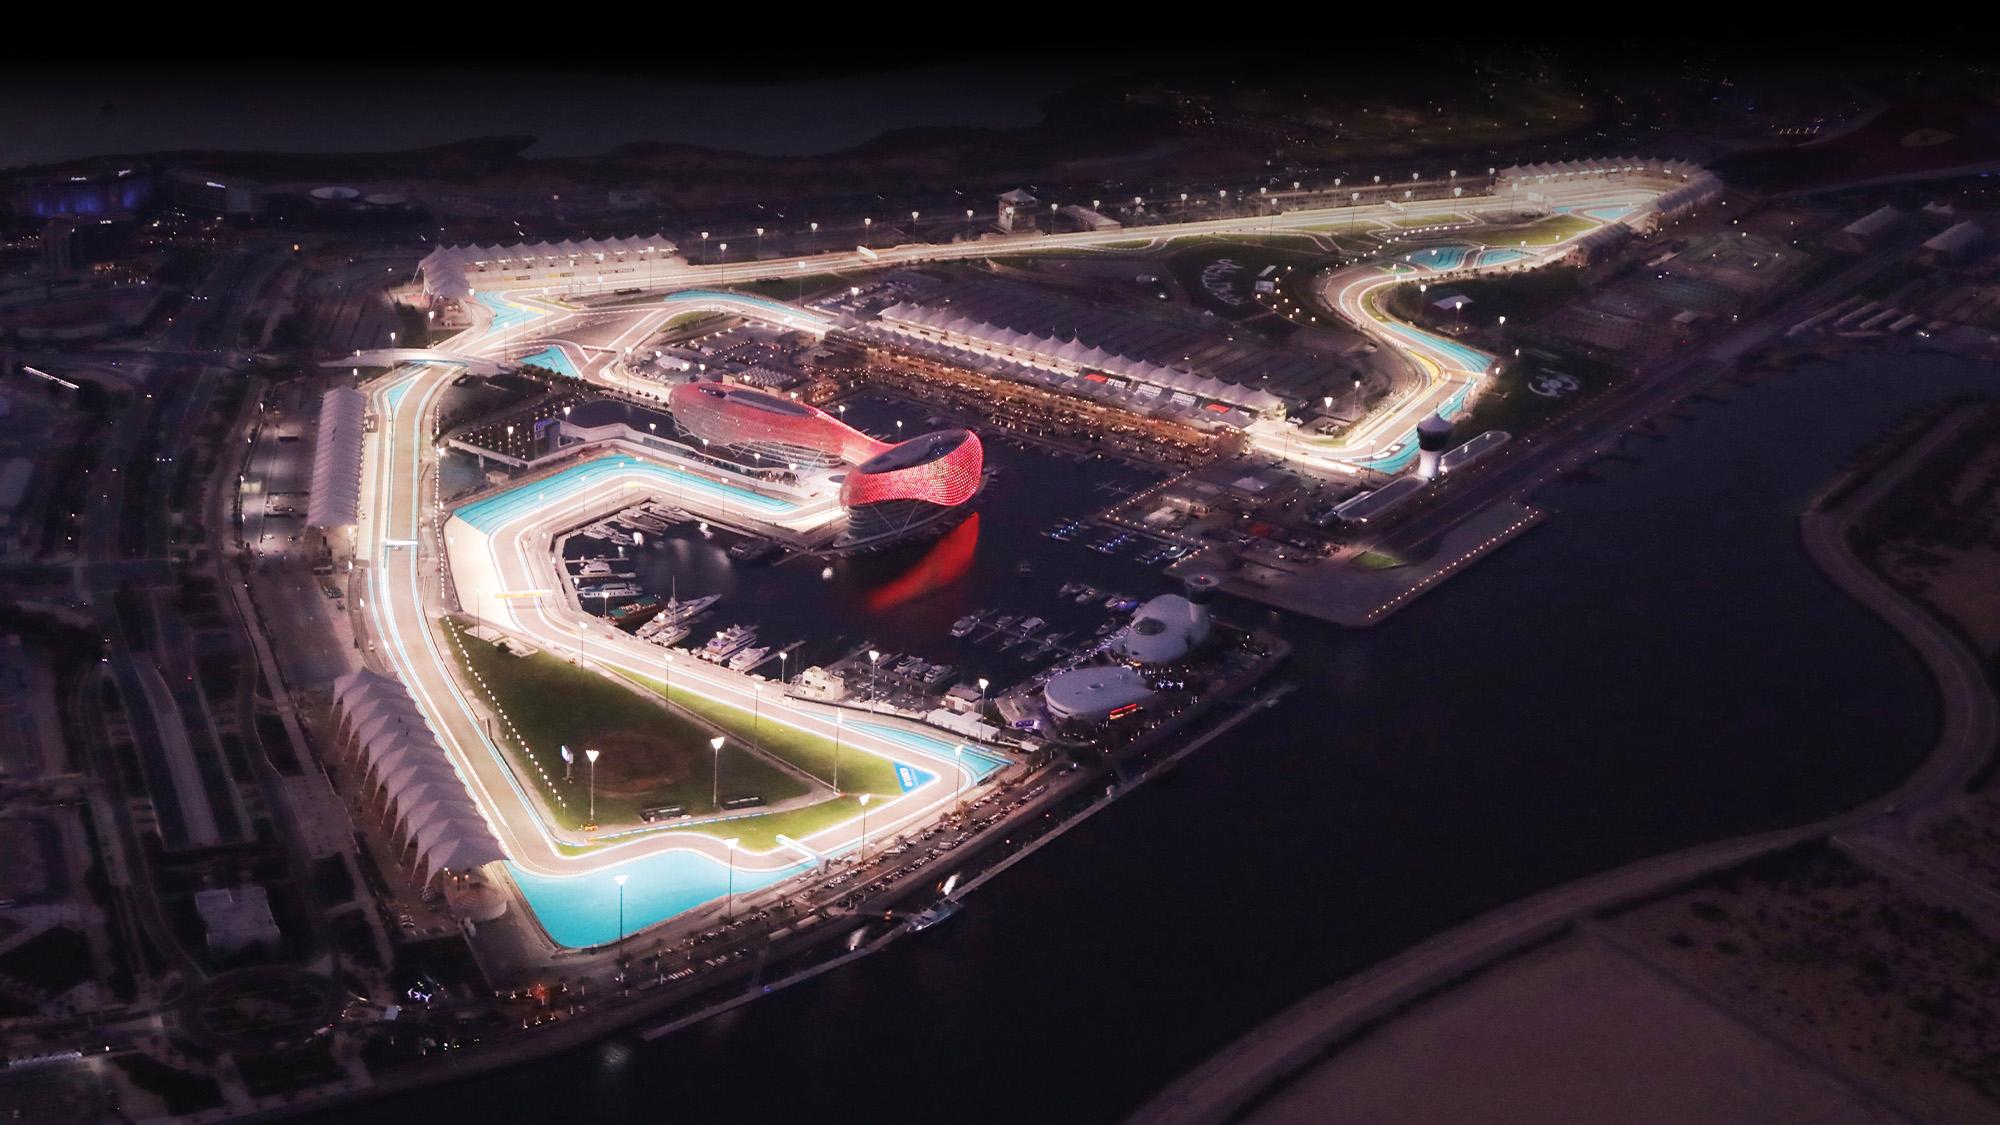 Yas Marina circuit at night